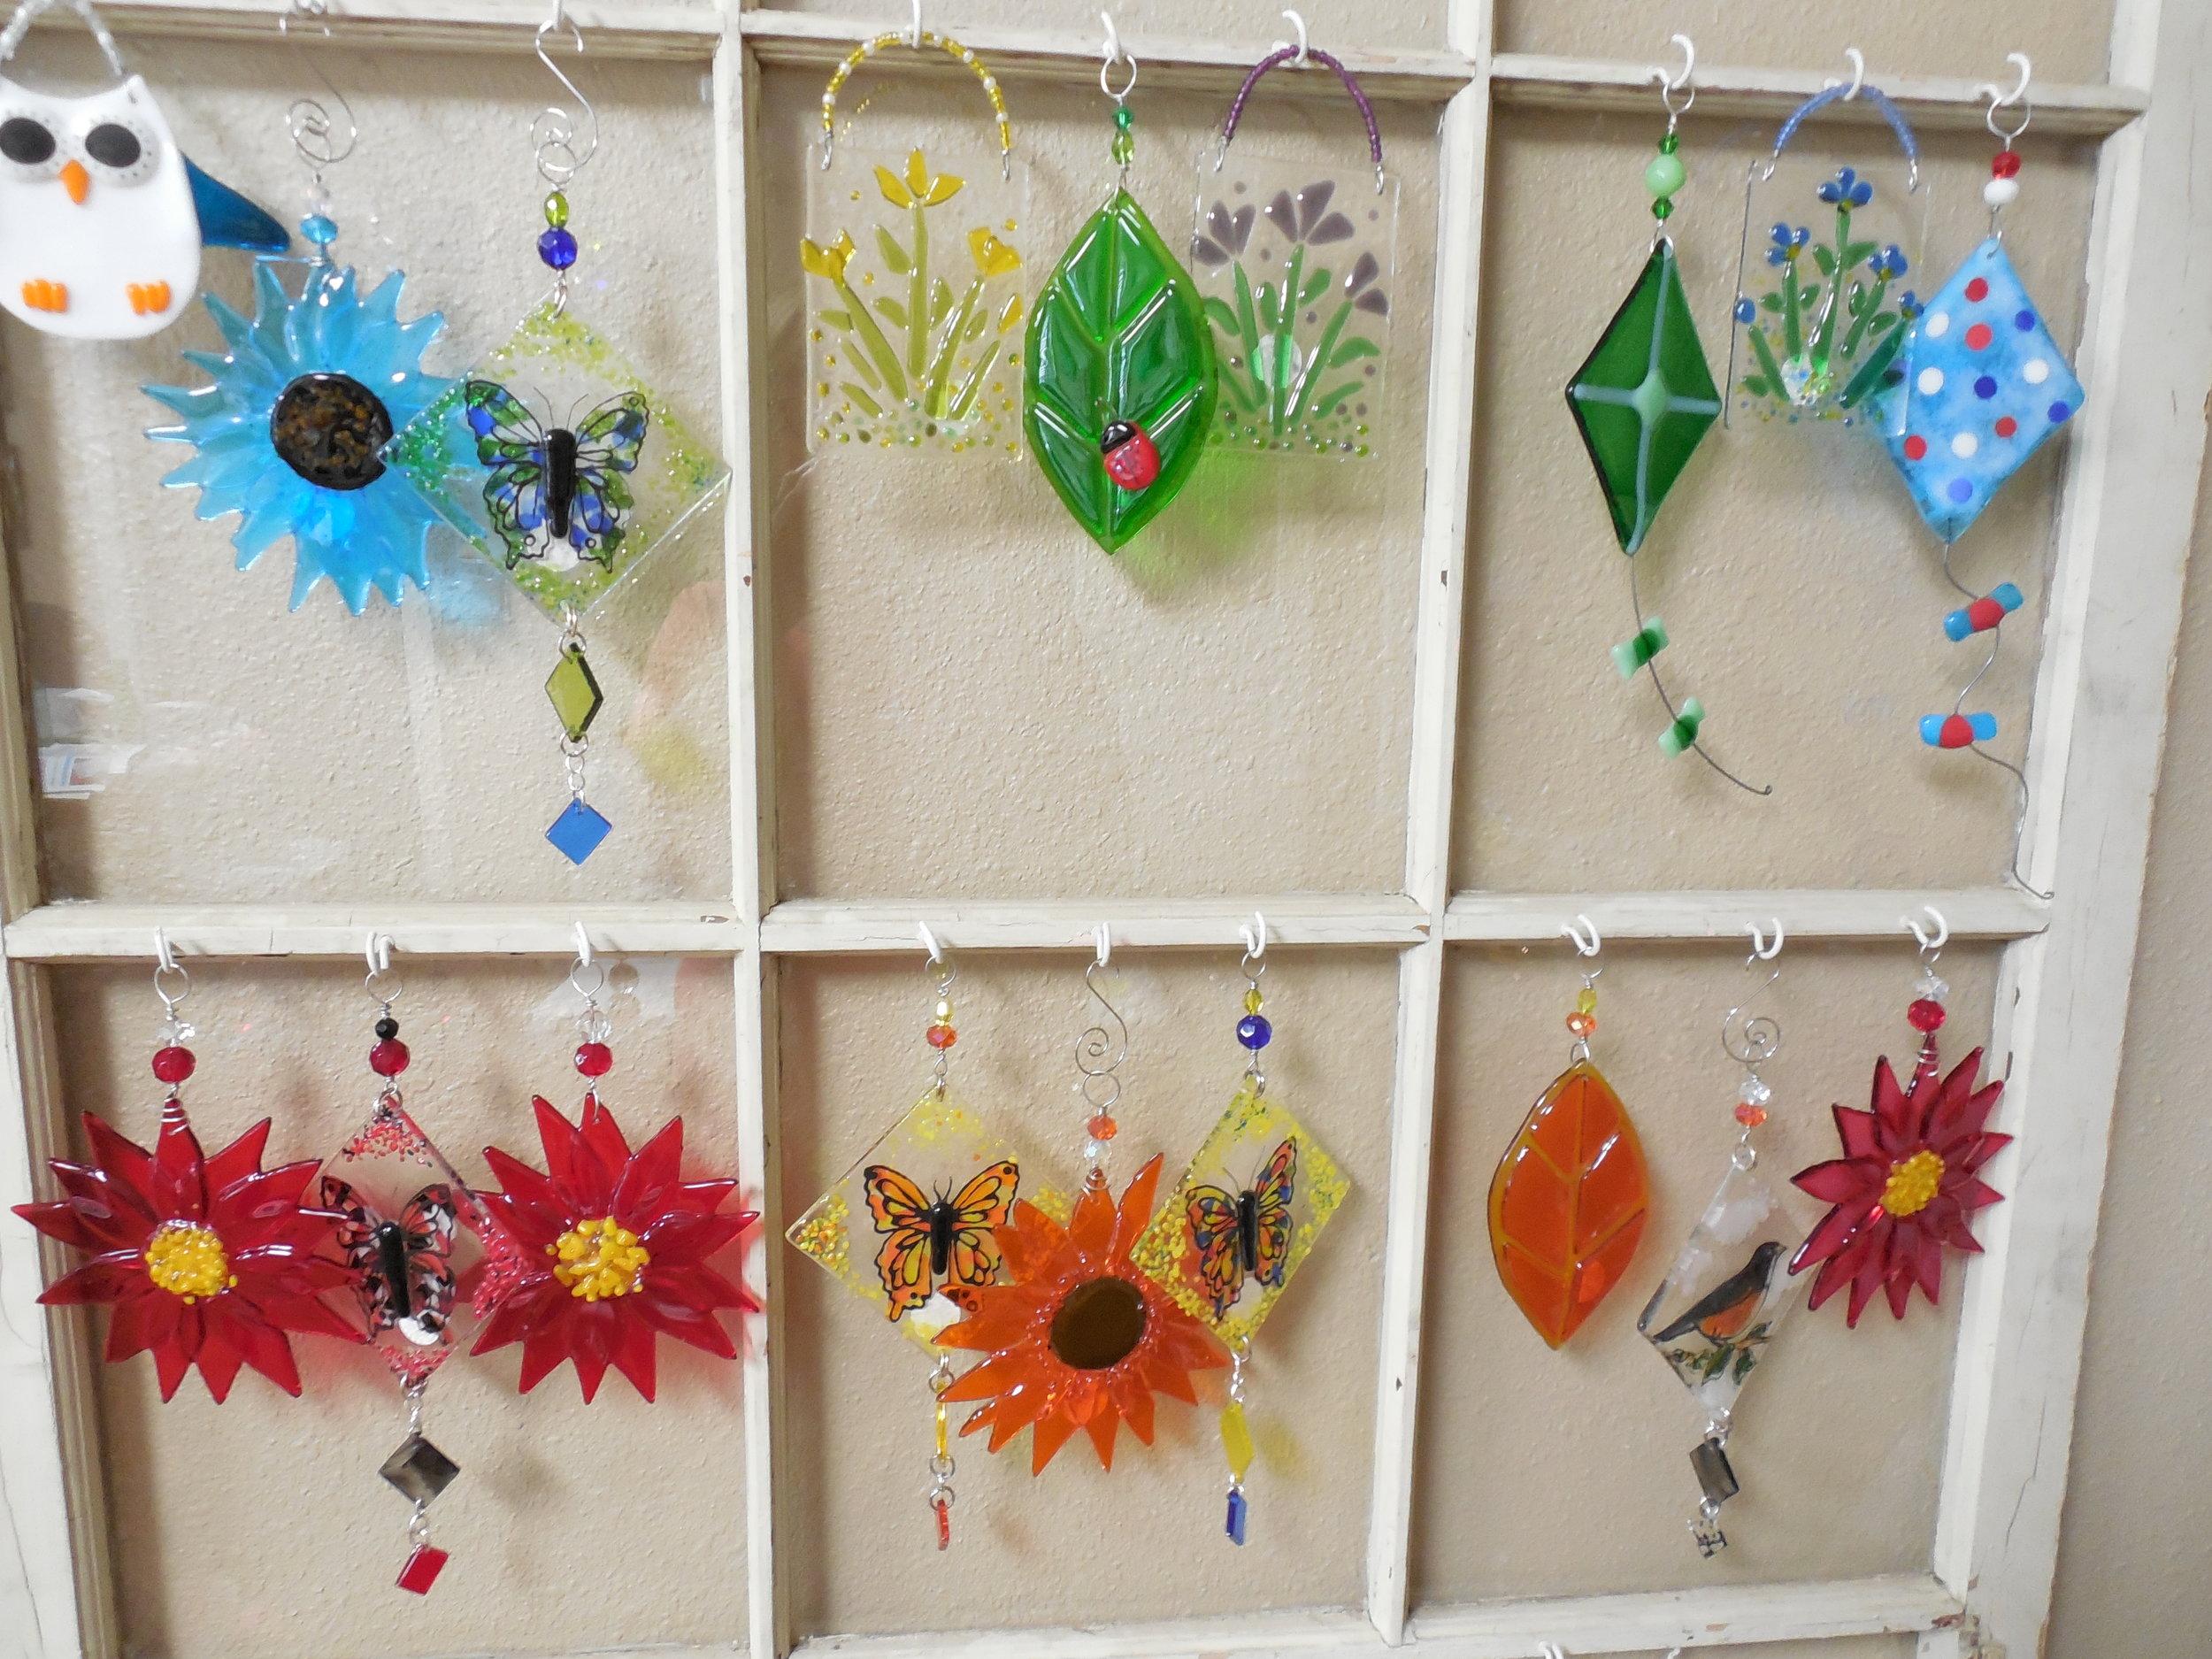 Jane's Glass Art